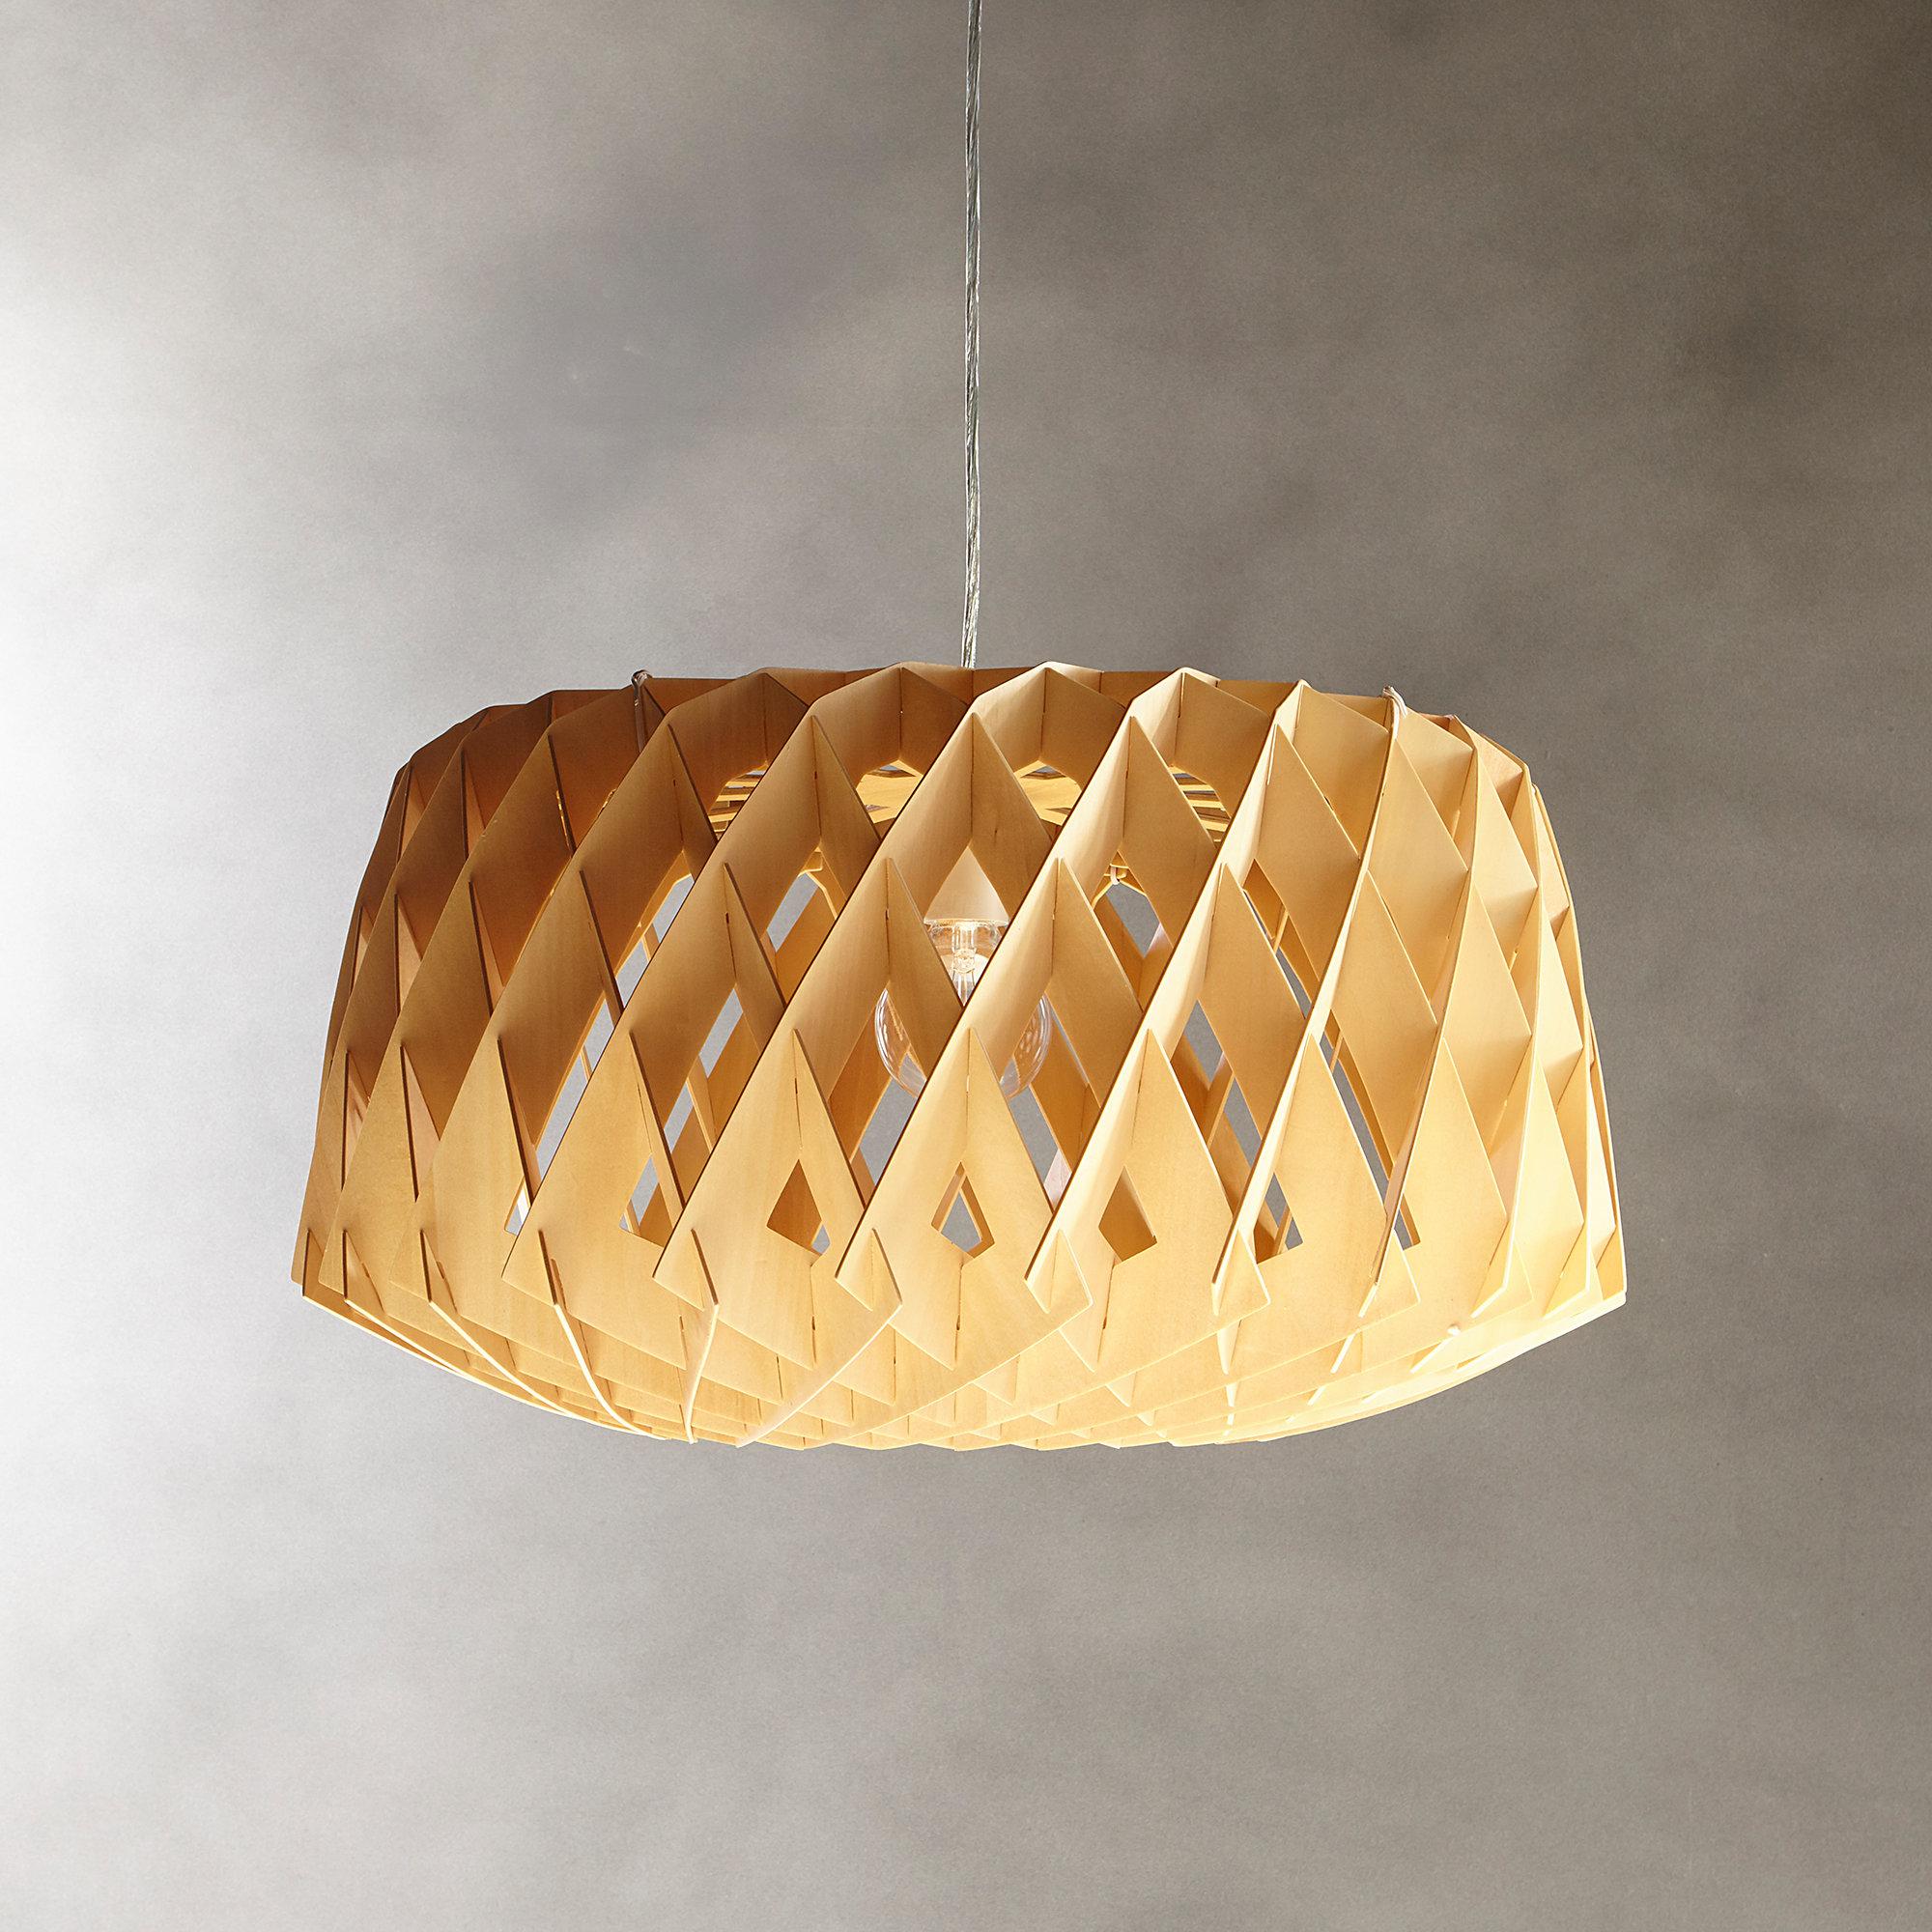 Brayden Studio Melora 1-Light Single Geometric Pendant with regard to Fashionable Melora 1-Light Single Geometric Pendants